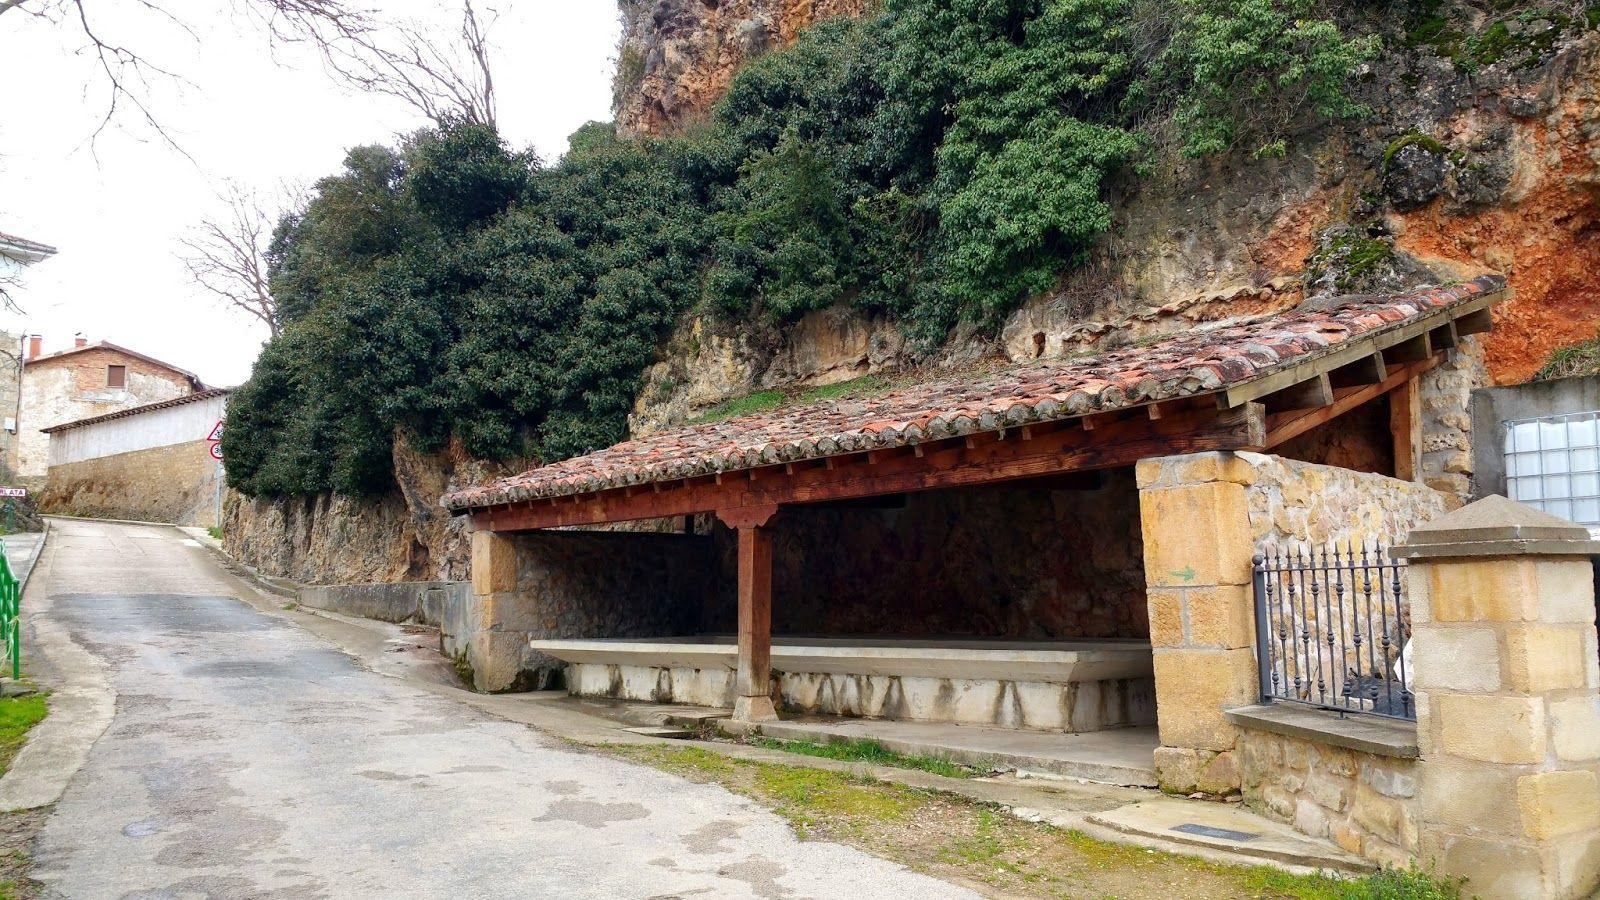 Cillaperlata, antigua tierra de monjes y eremitas